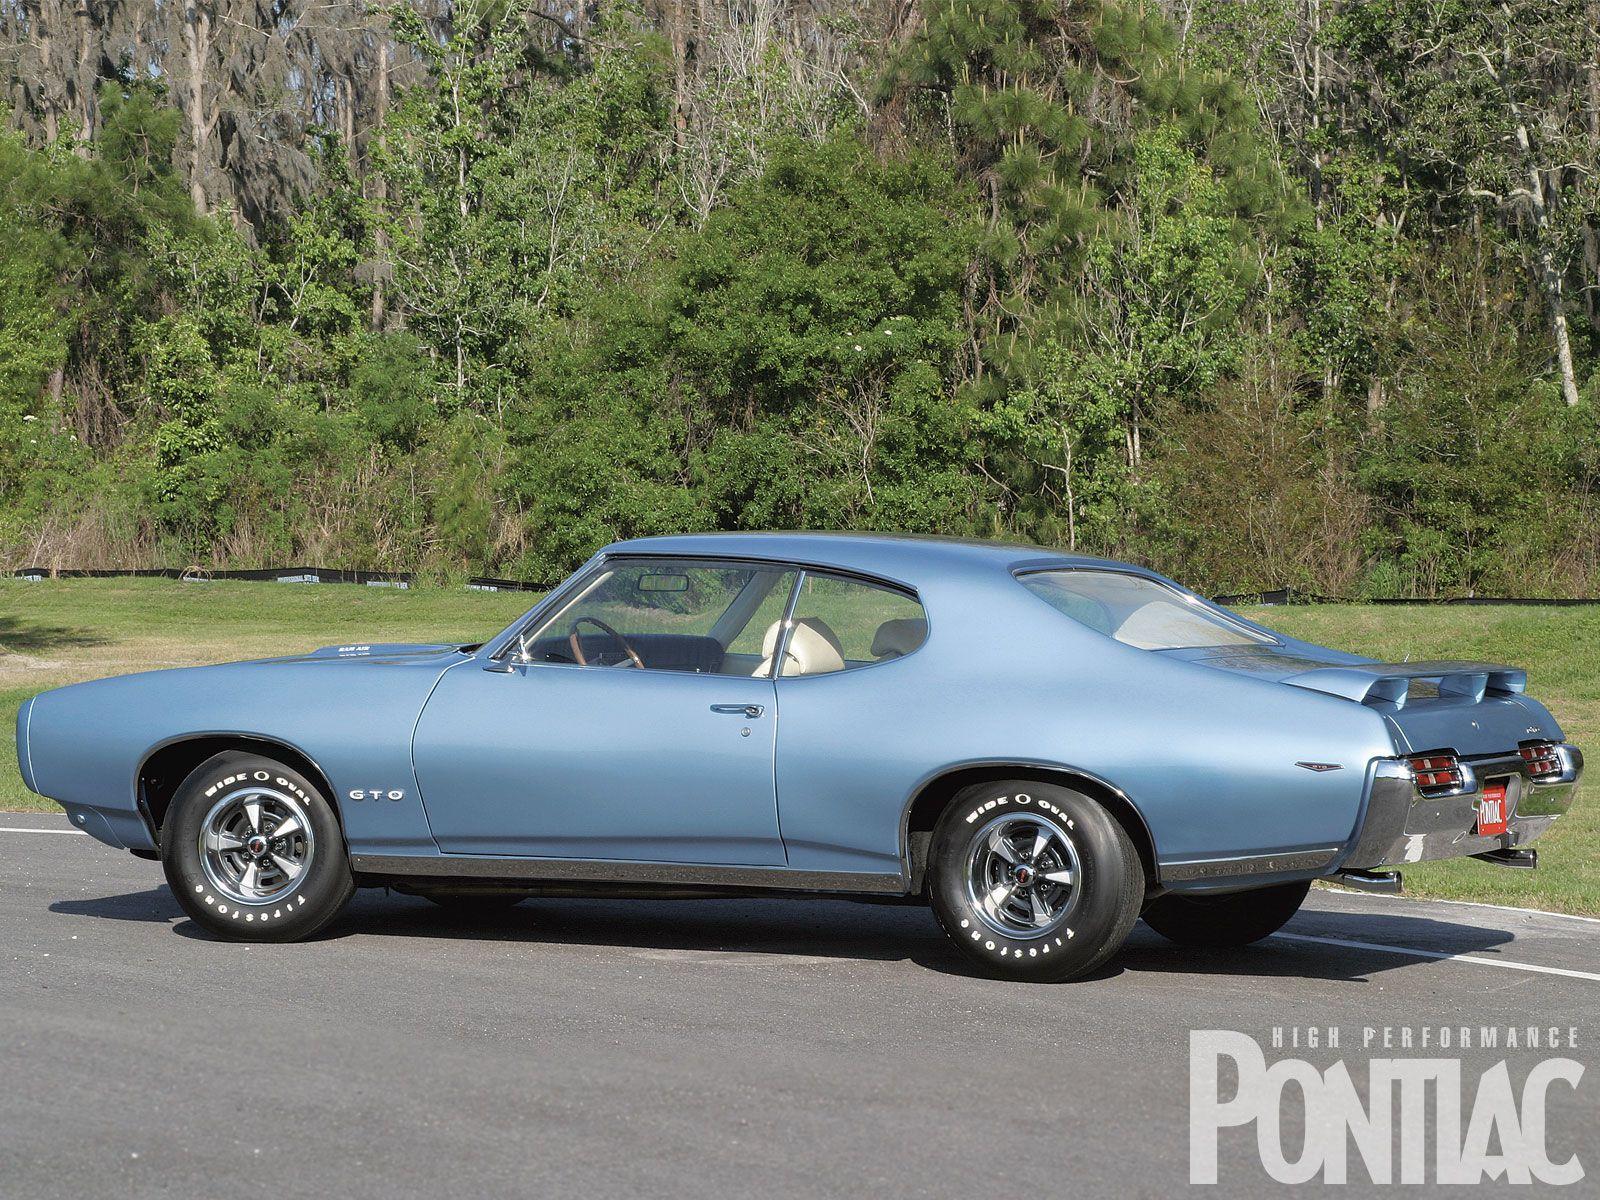 1969 Pontiac Gto Pontiac Gto Pontiac Gto 1969 Gto